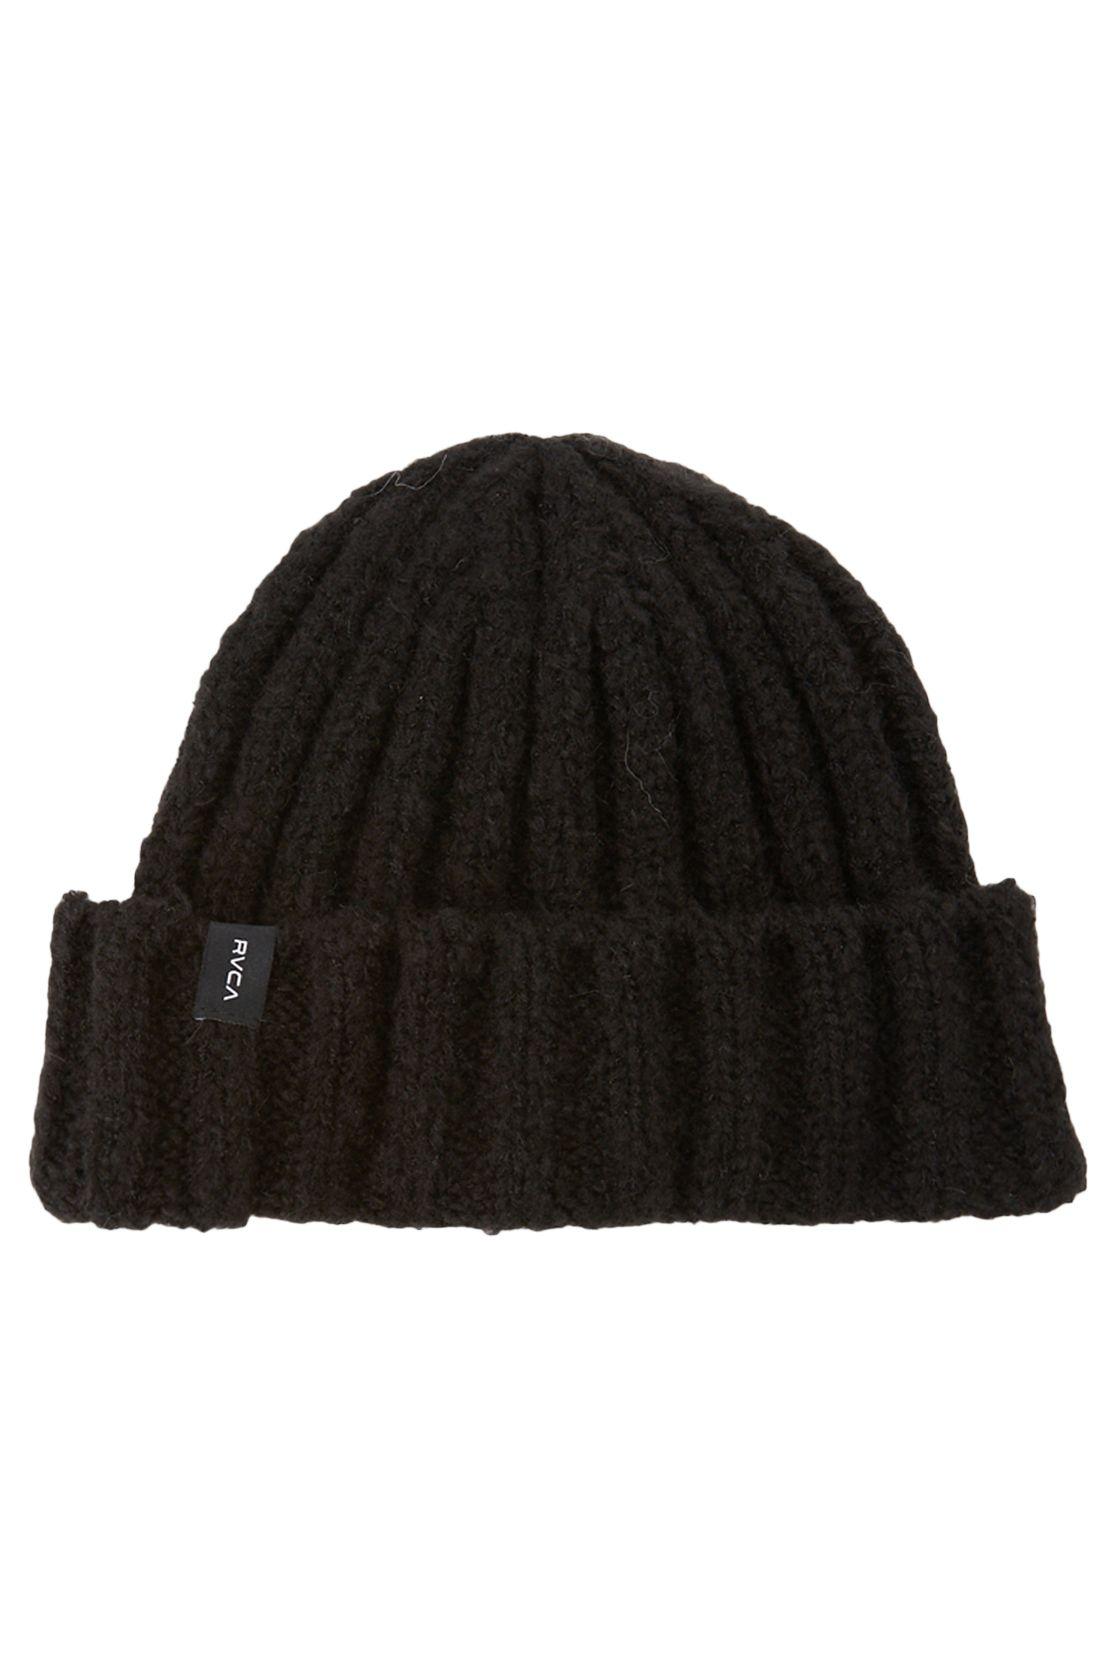 RVCA Beanie WARM EYES BEANIE True Black